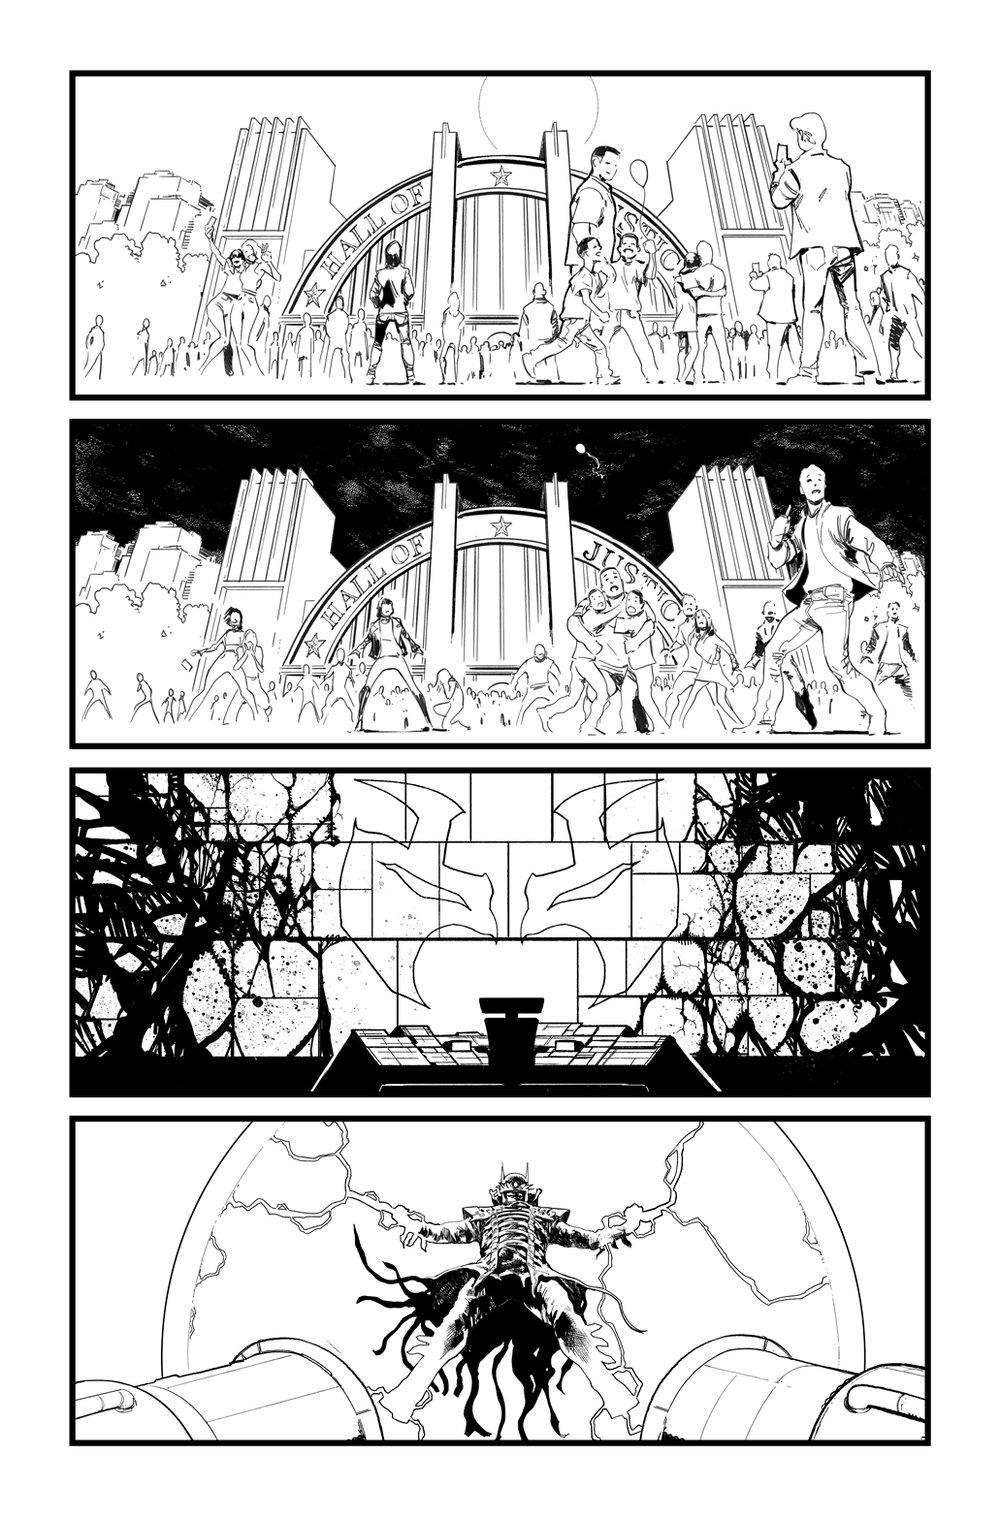 Image of BATMAN/SUPERMAN #3 p.23 ARTIST'S PROOF